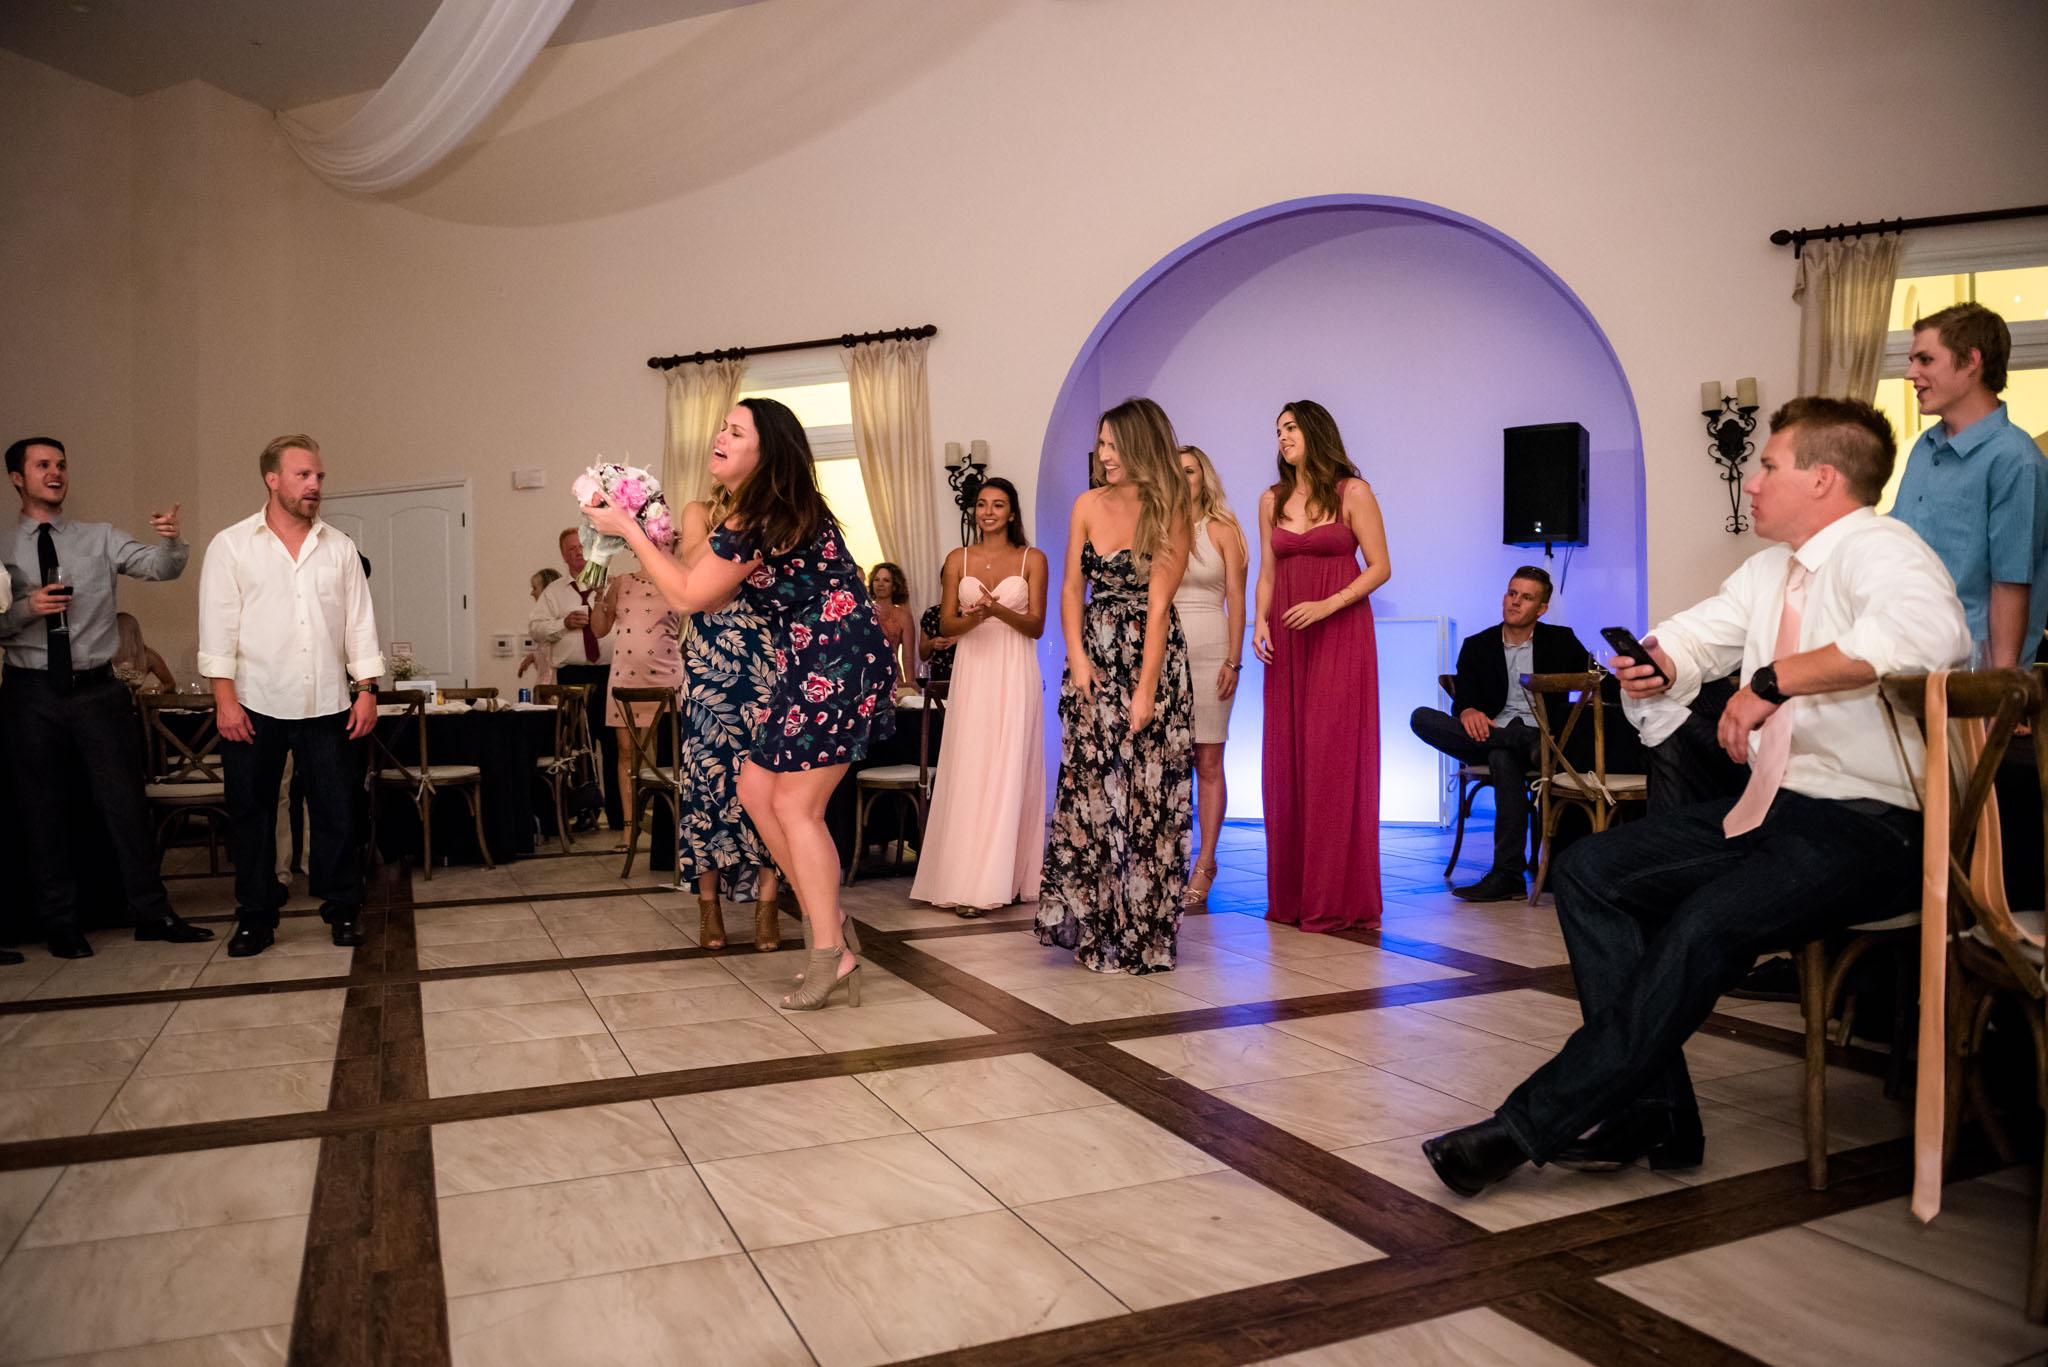 Avensole-Winery-Temecula-Wedding-Josh-and-Olivia-4428.JPG